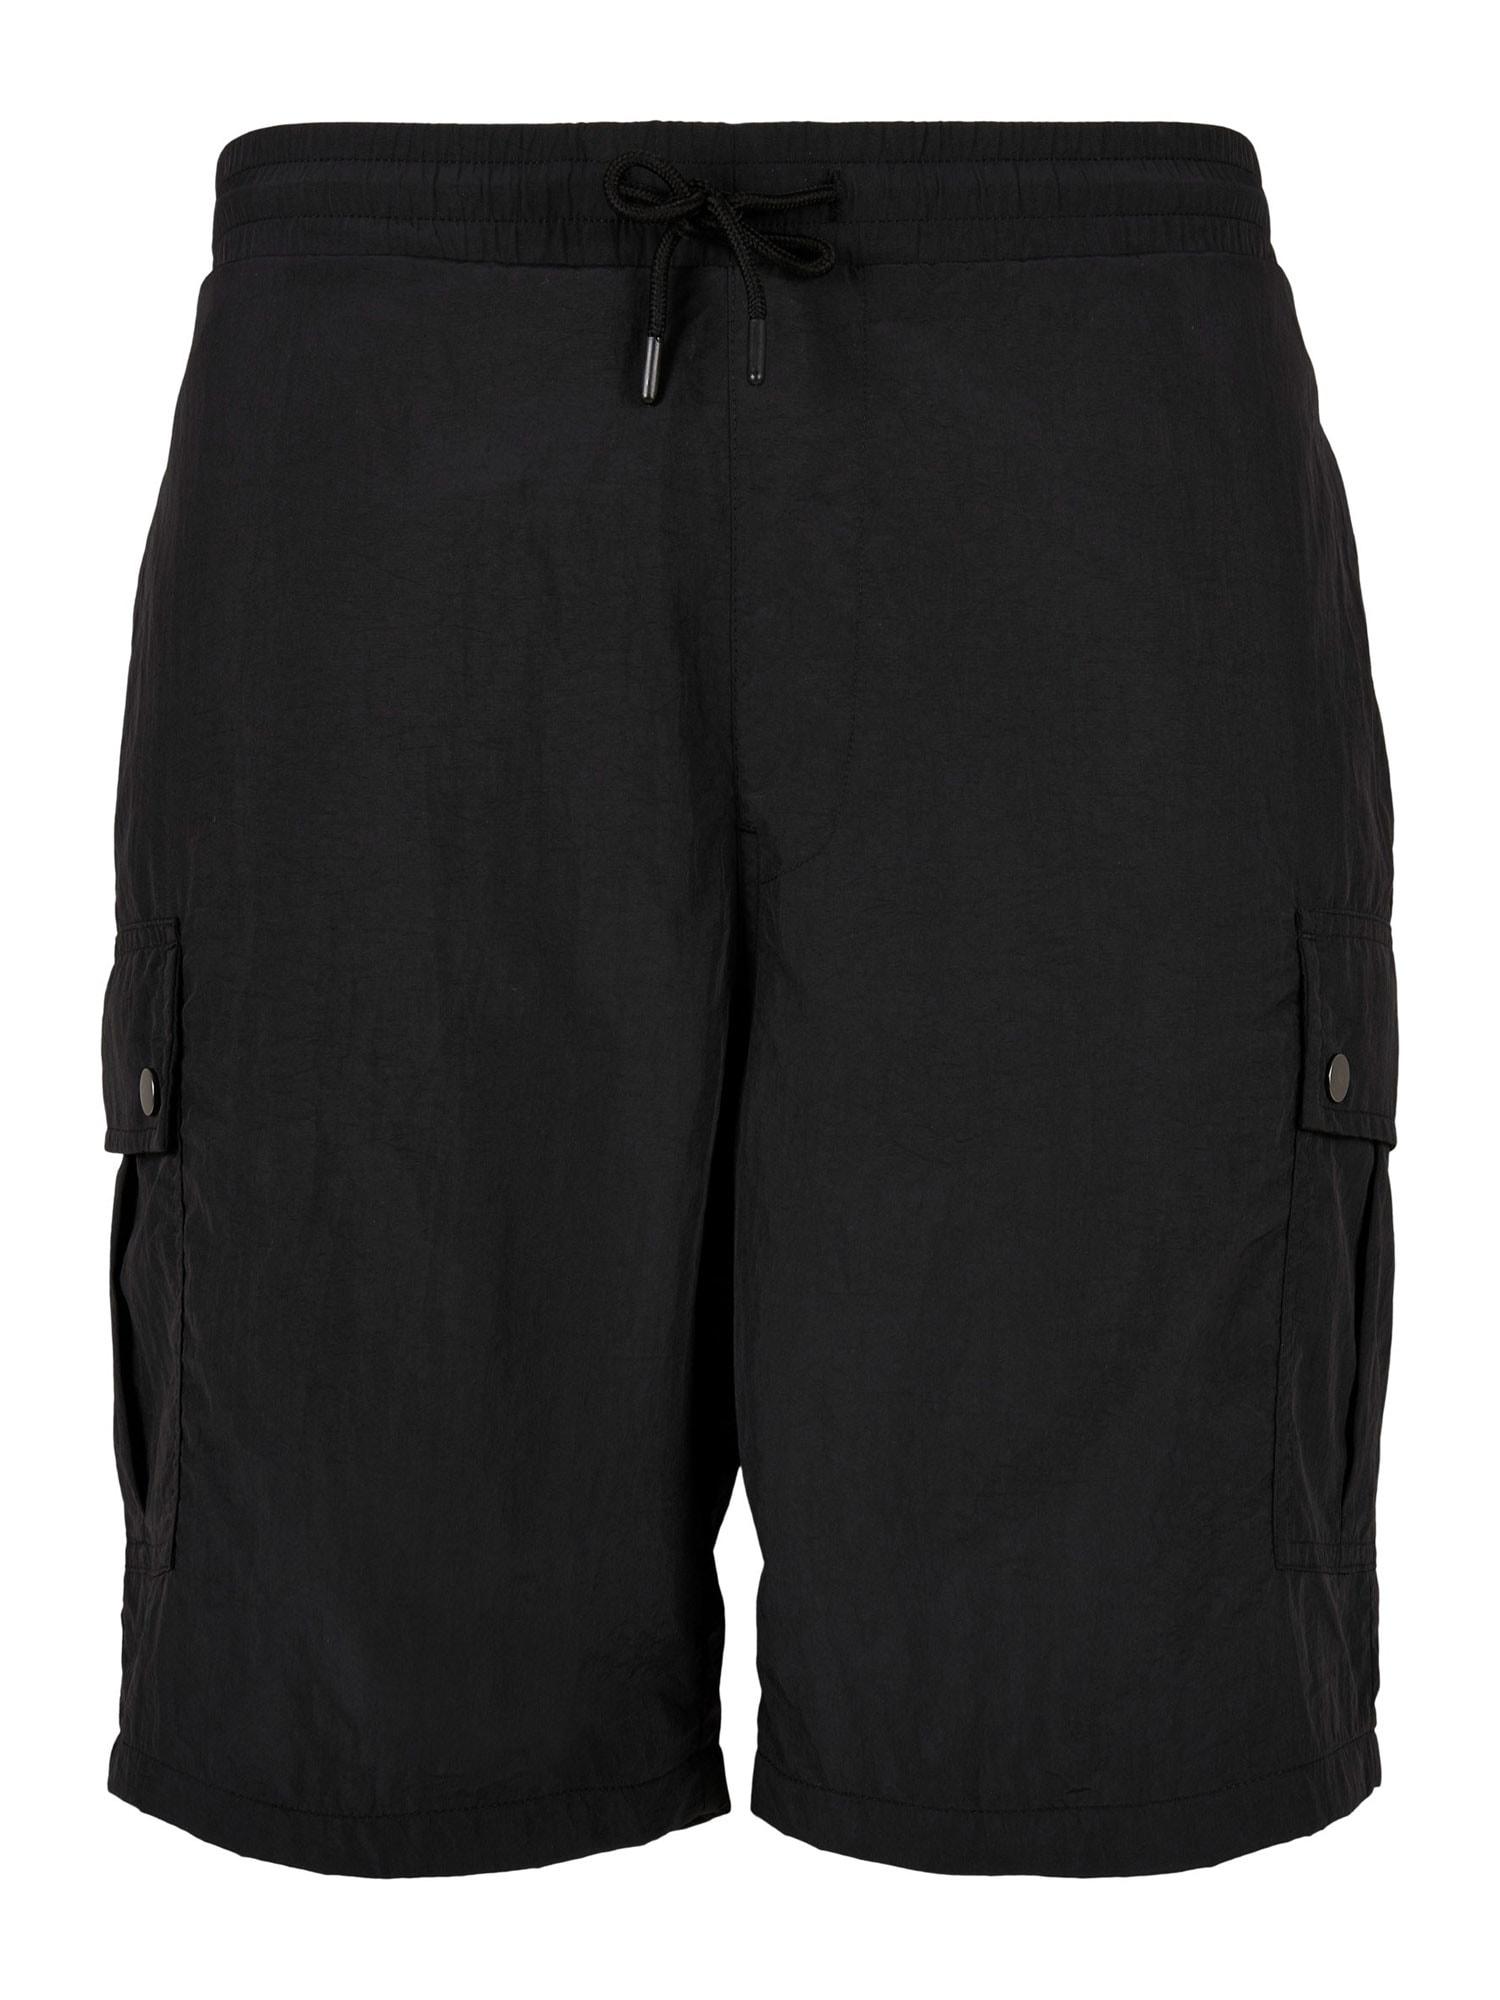 Urban Classics Big & Tall Laisvo stiliaus kelnės juoda